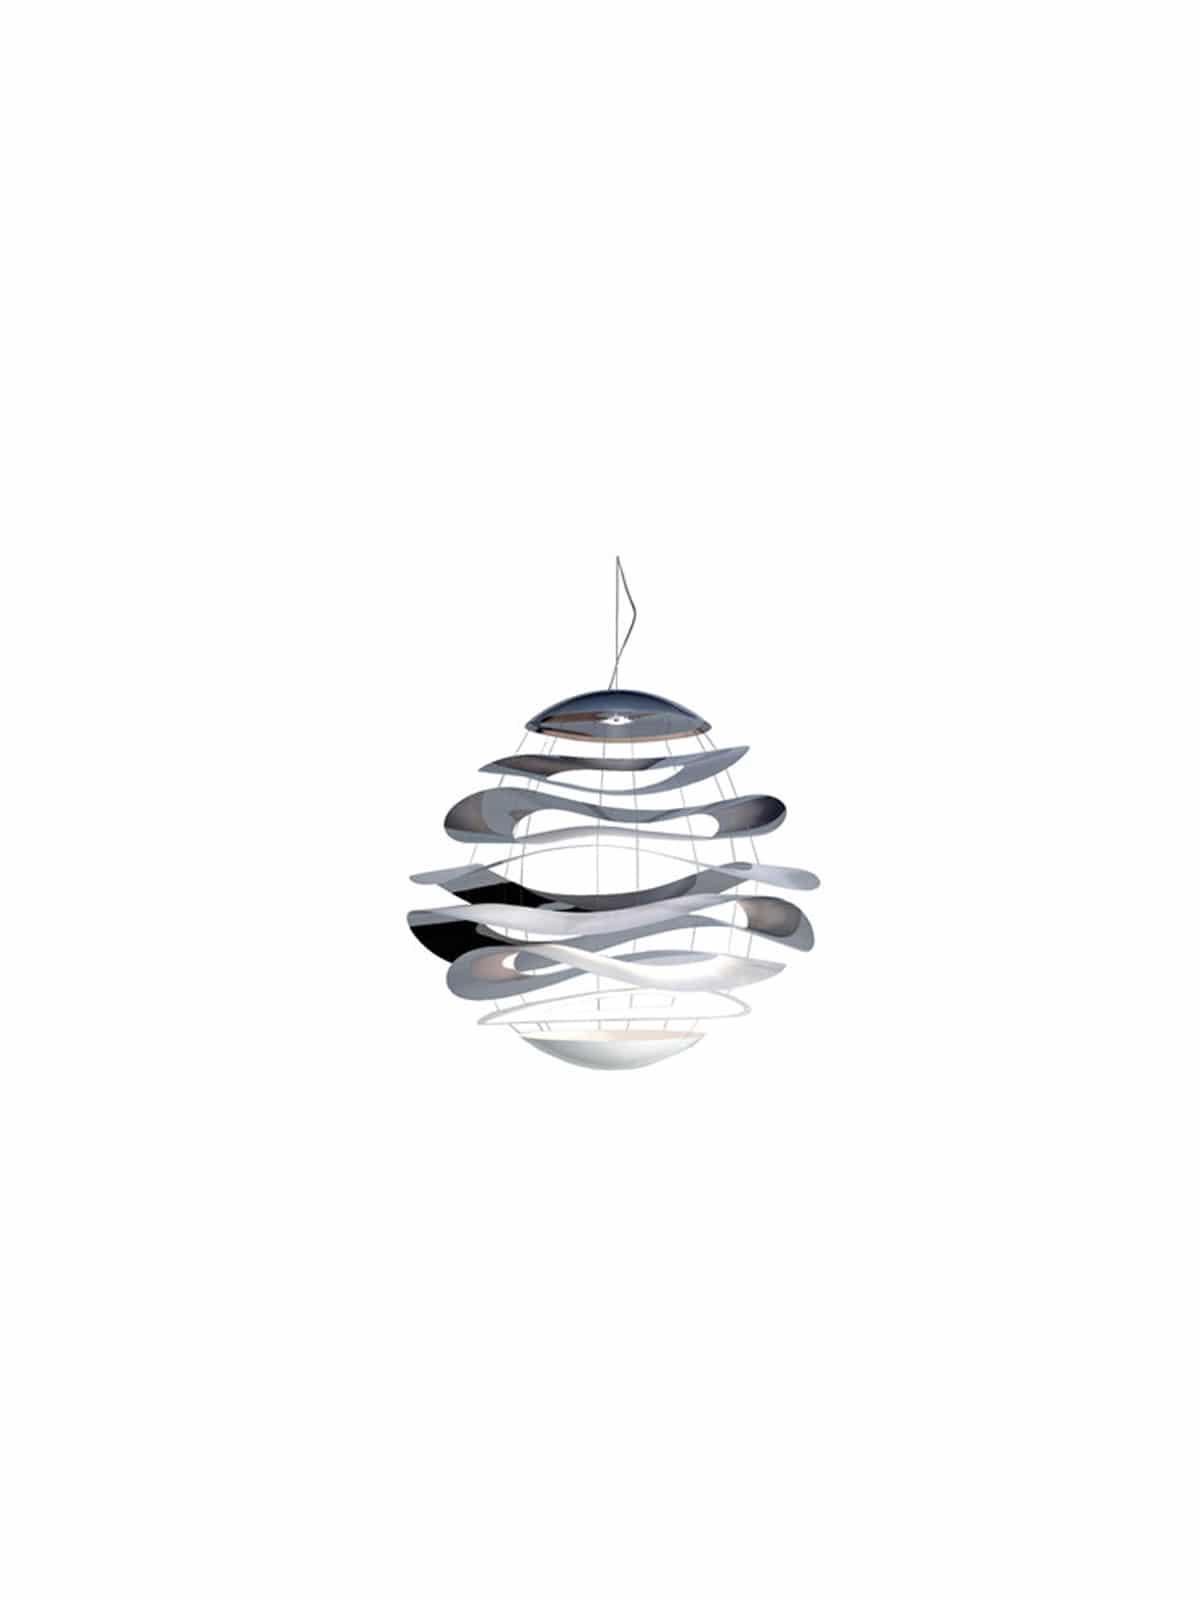 grosse Pendel Lampe Buckle von Innermost